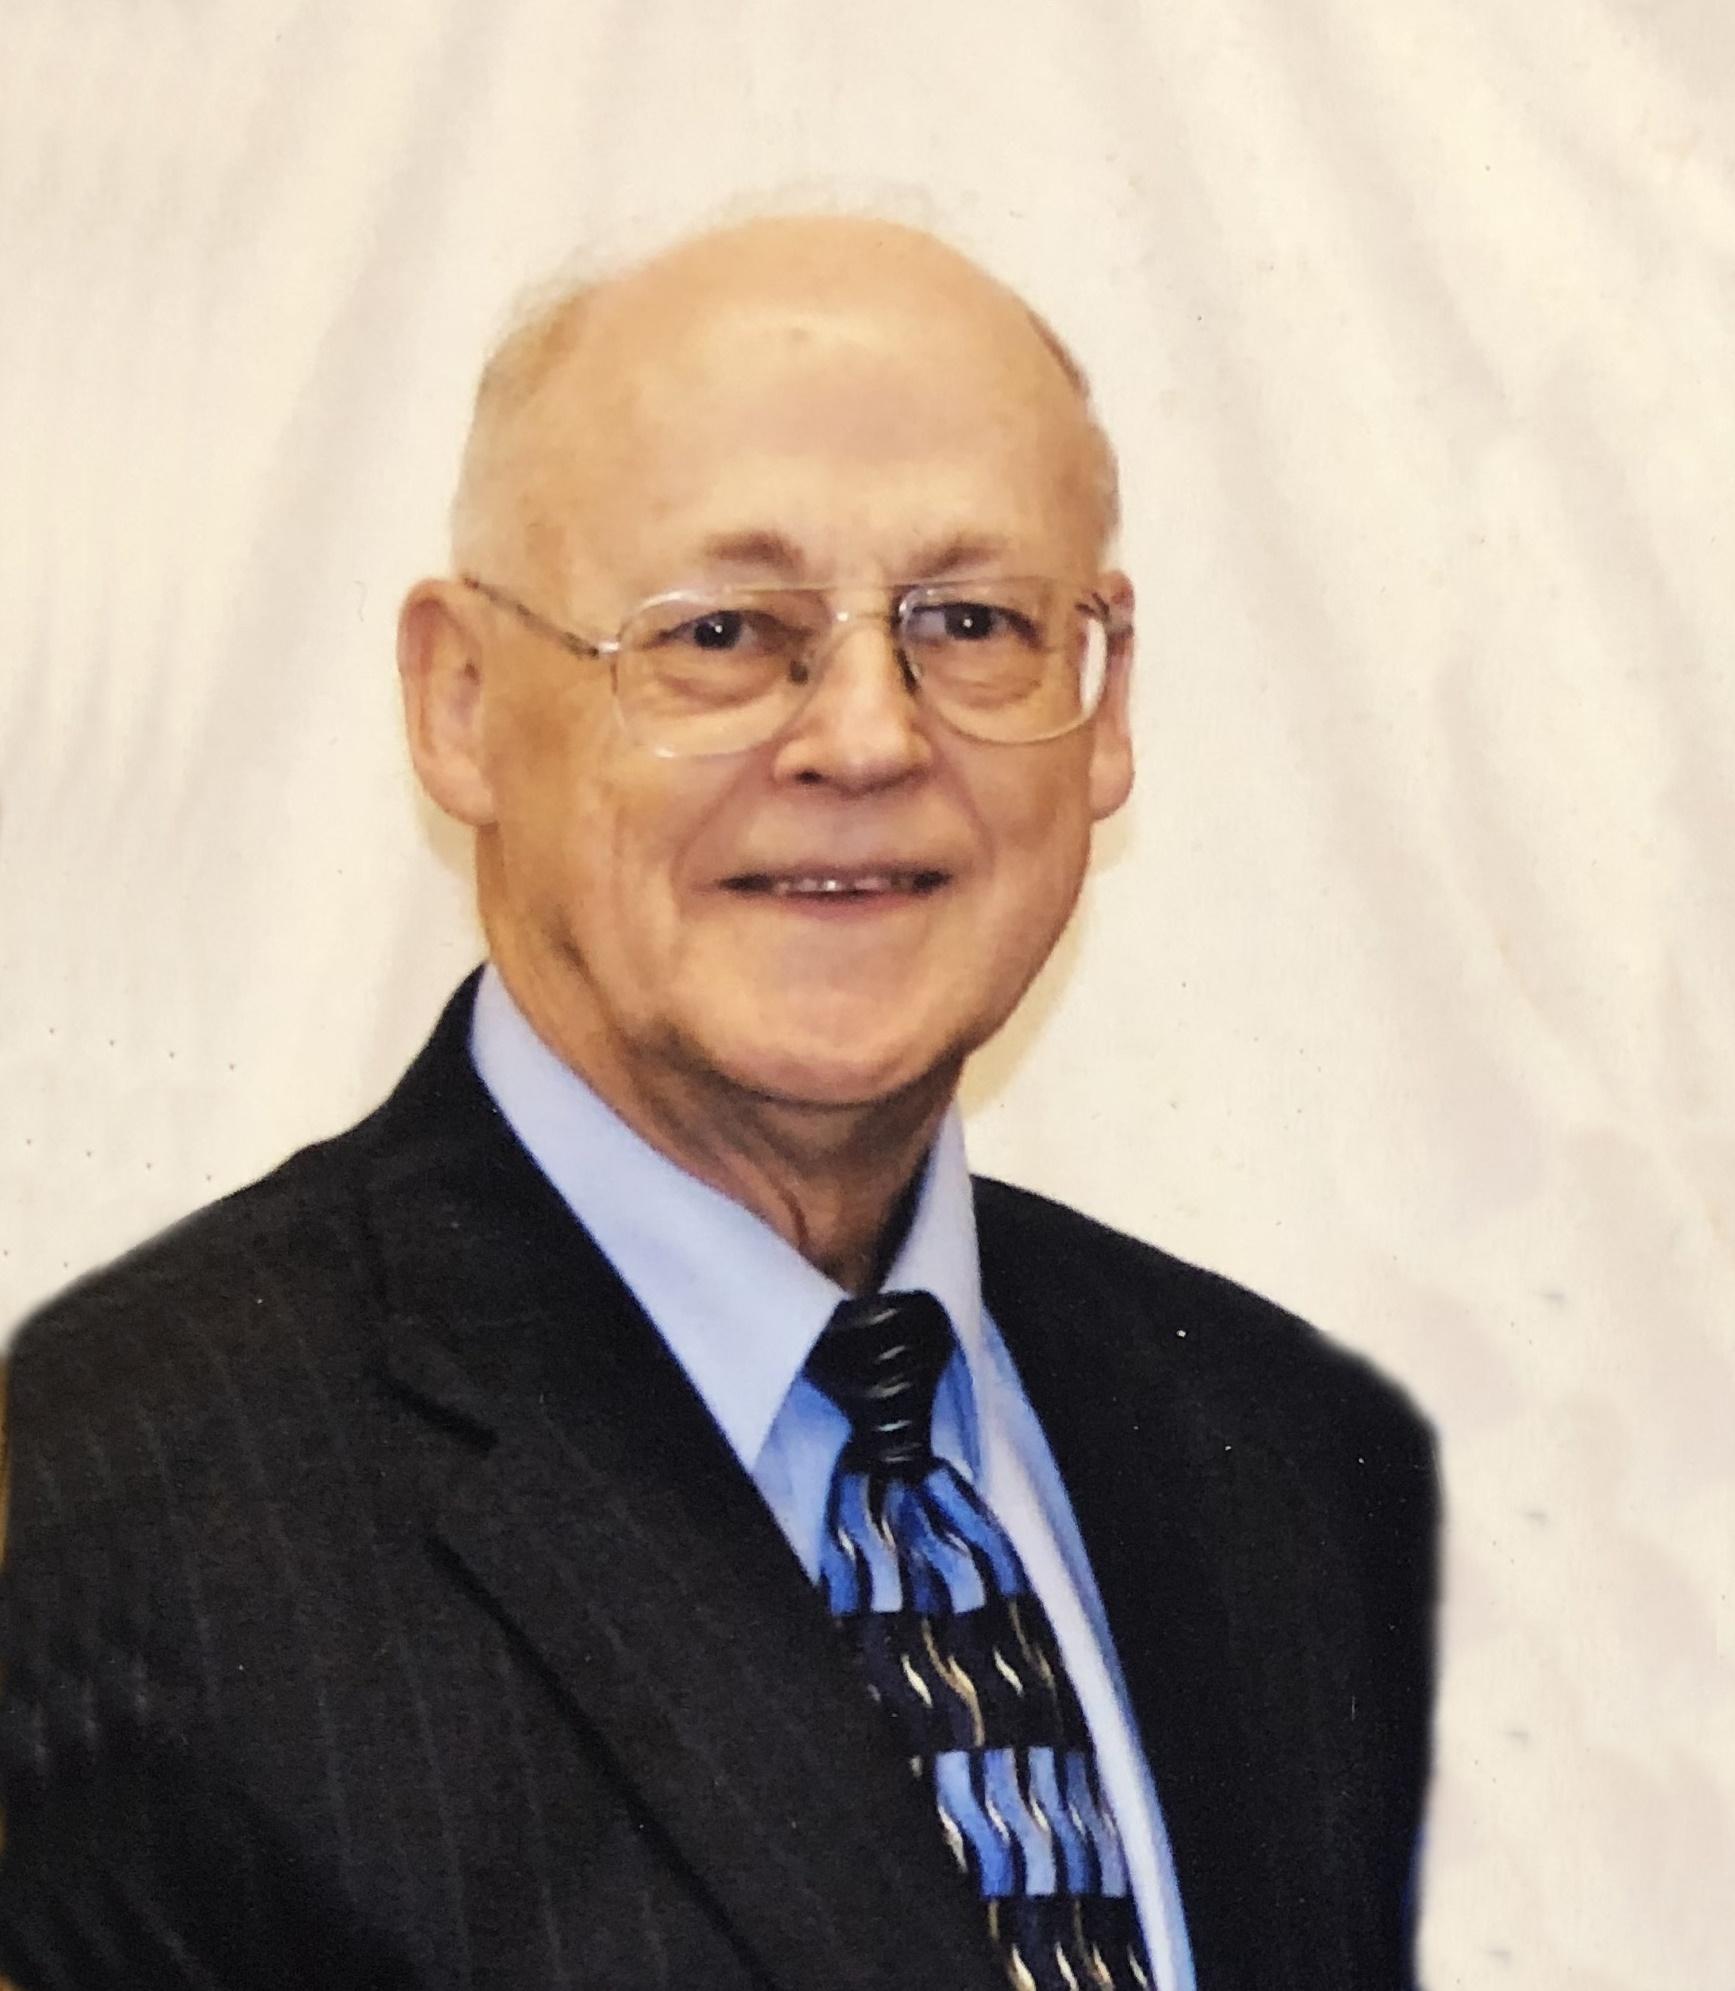 Lawrence (Larry) John Meister, age 88, of Schuyler, Nebraska